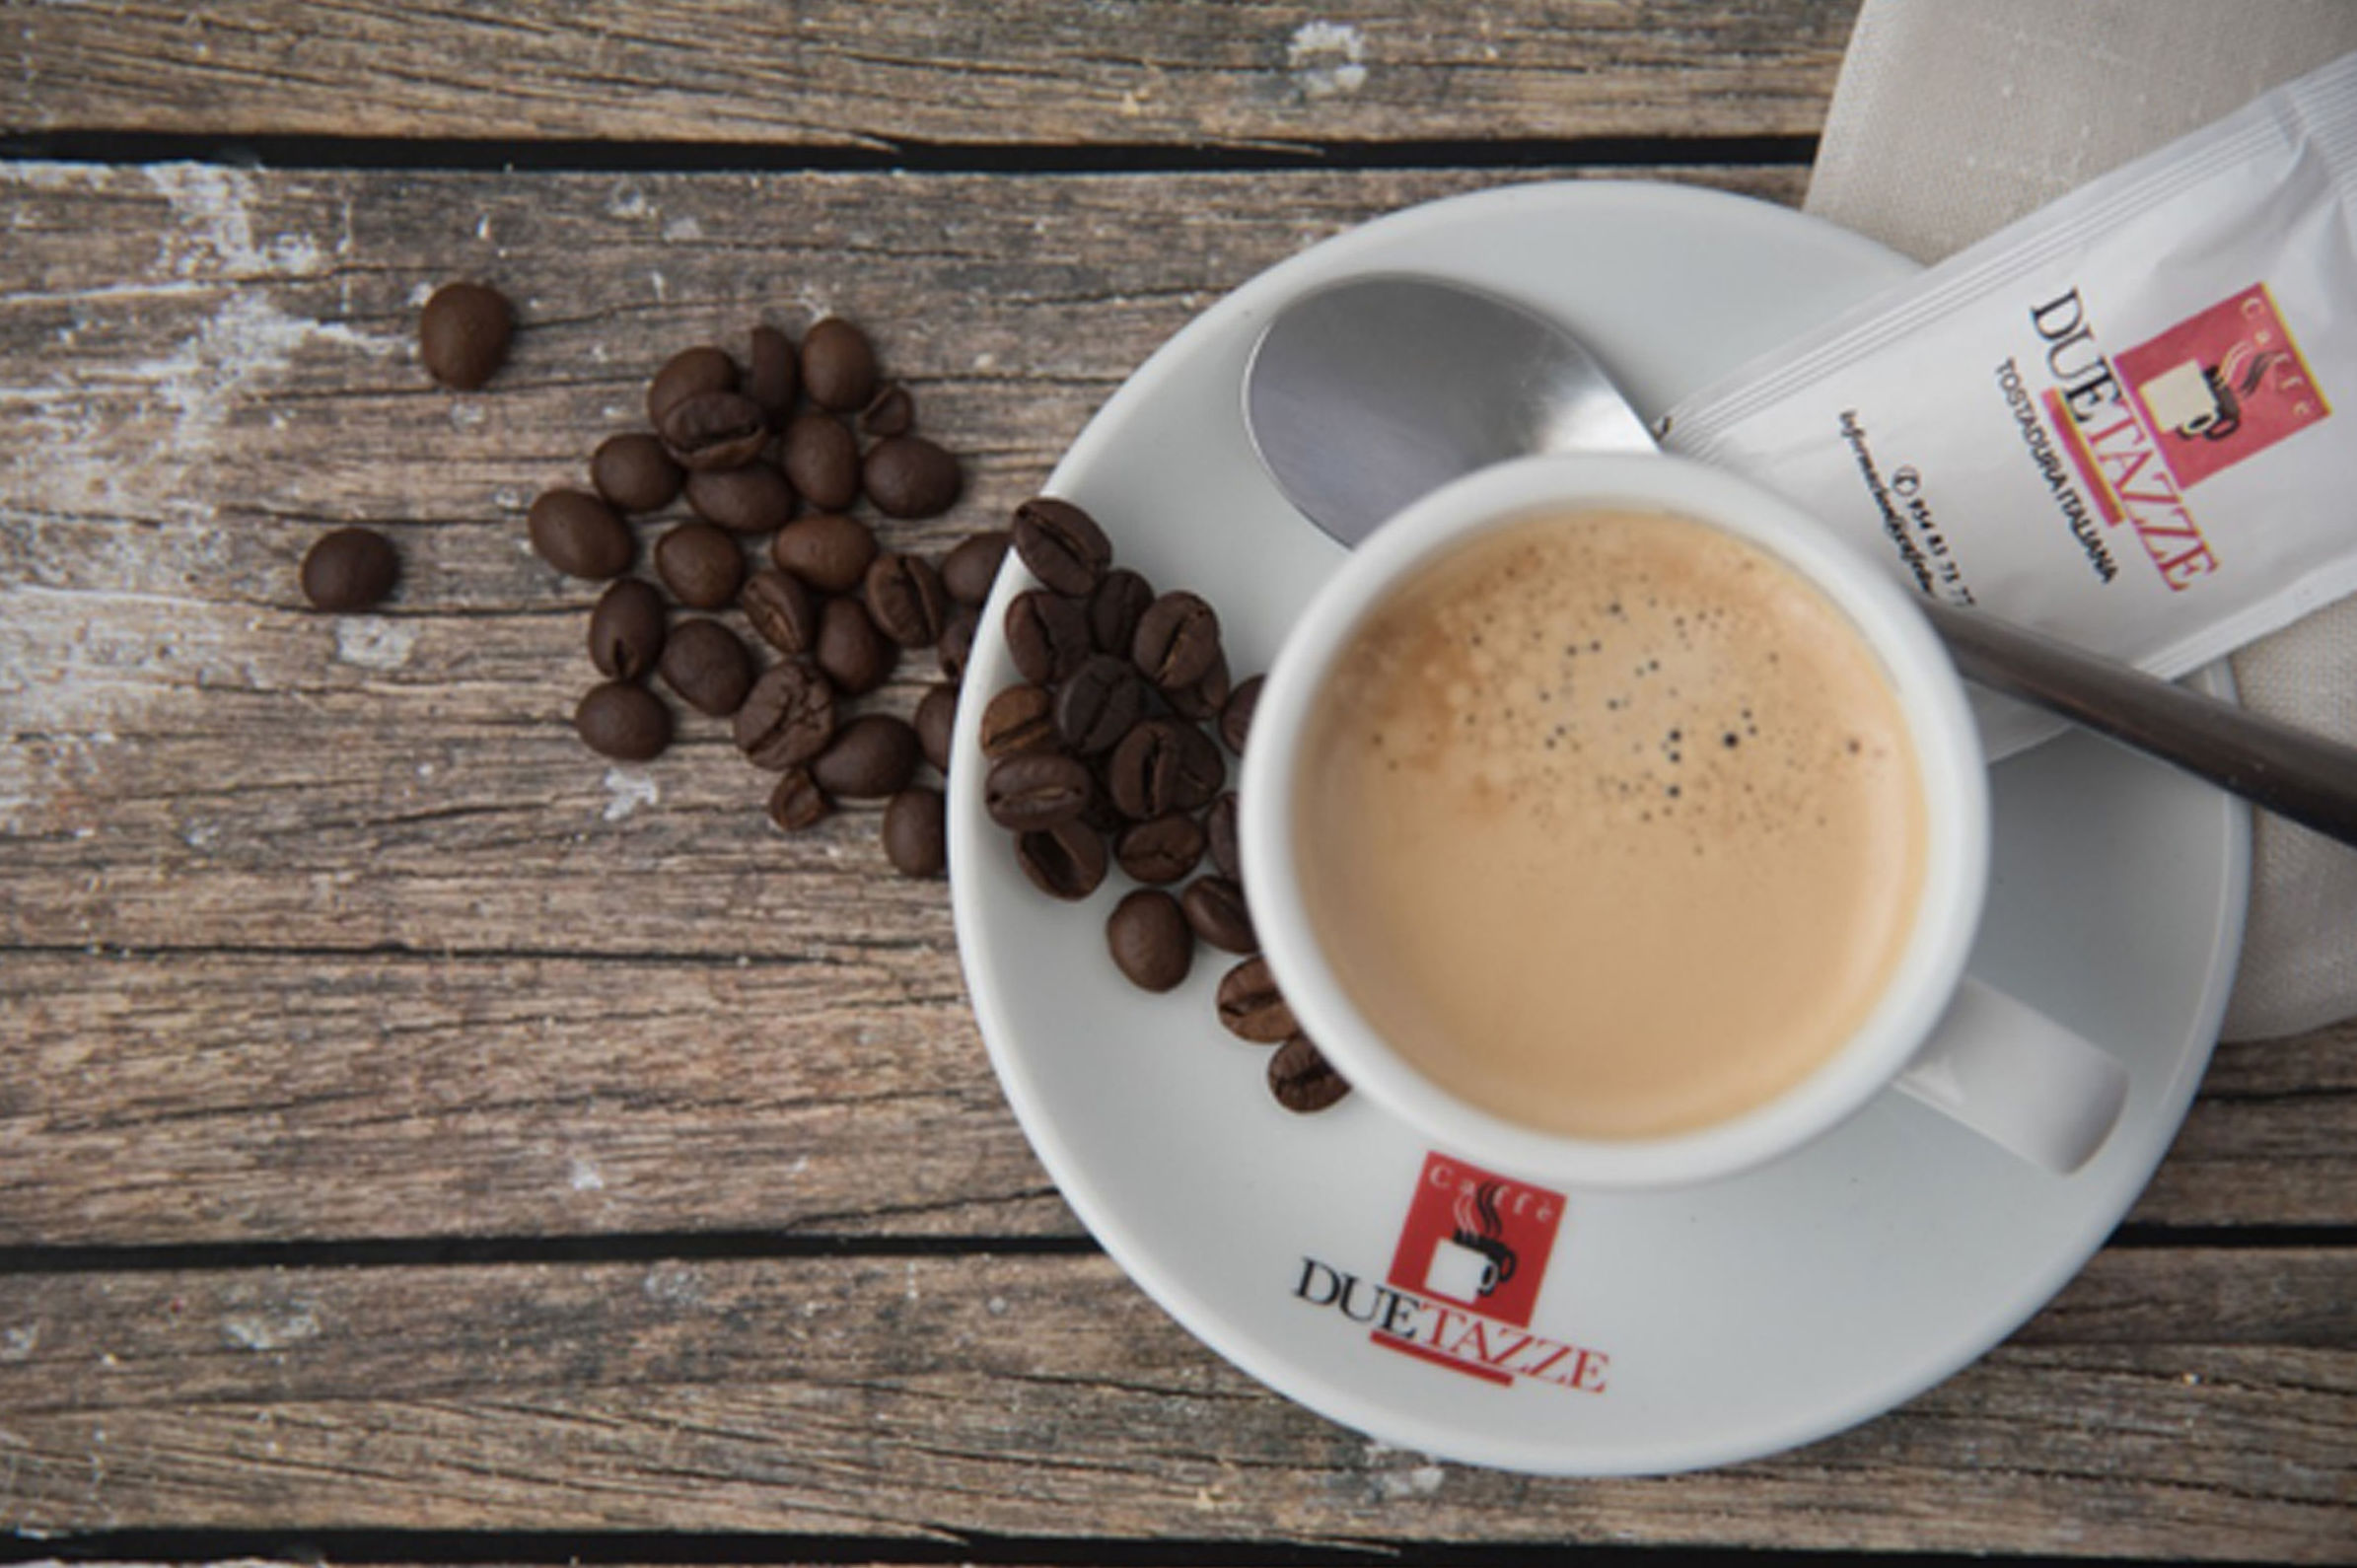 Foto 3 de Cafés en Fuentes de Andalucía | Caffè Duetazze